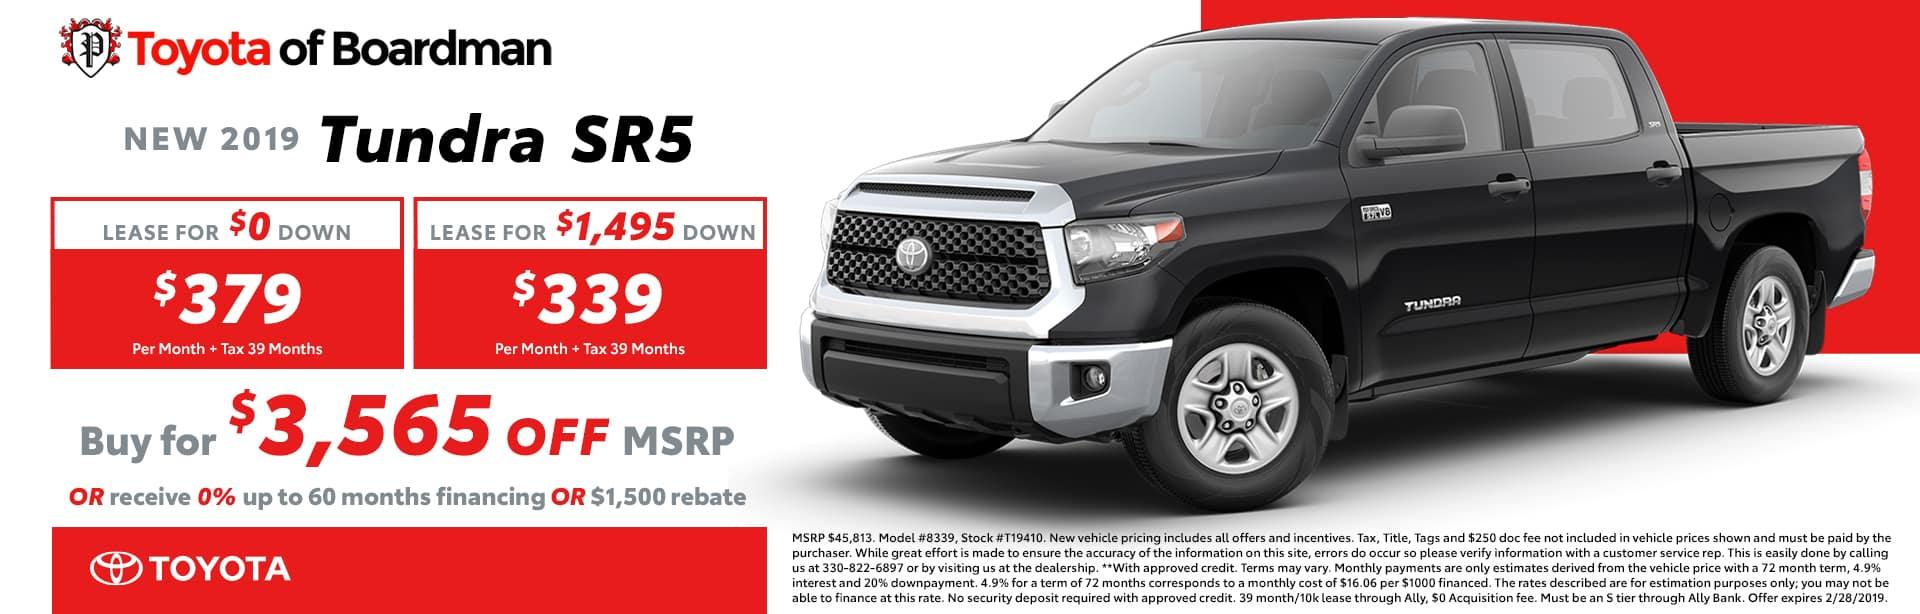 2019 Tundra SR5 Special